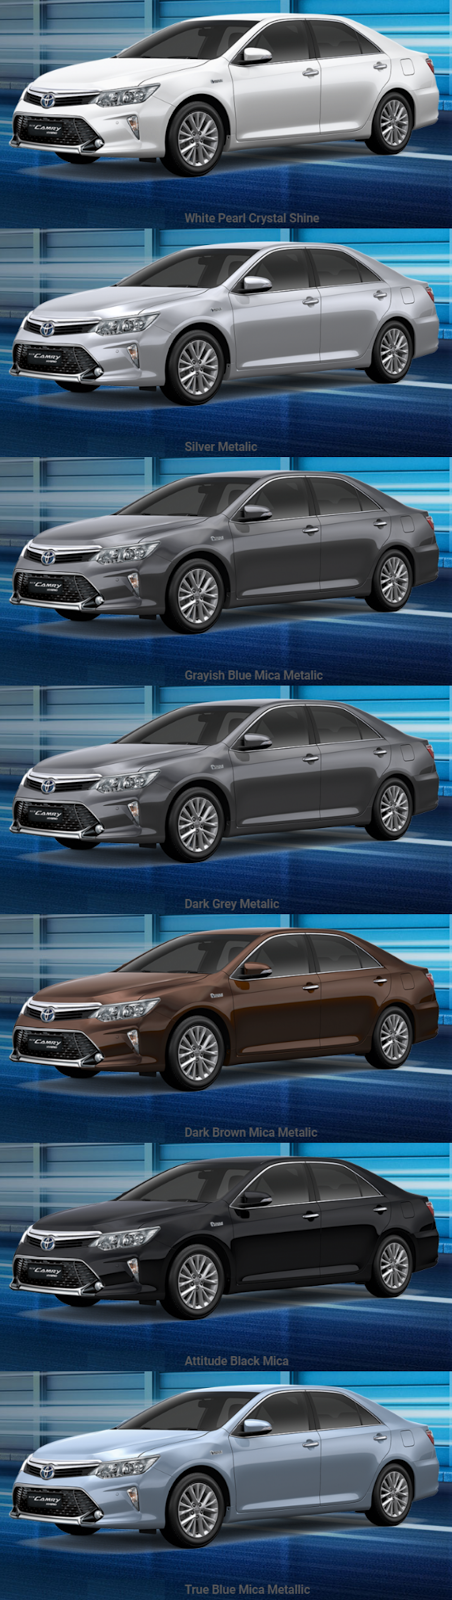 warna-mobil-new-camry-hybrid